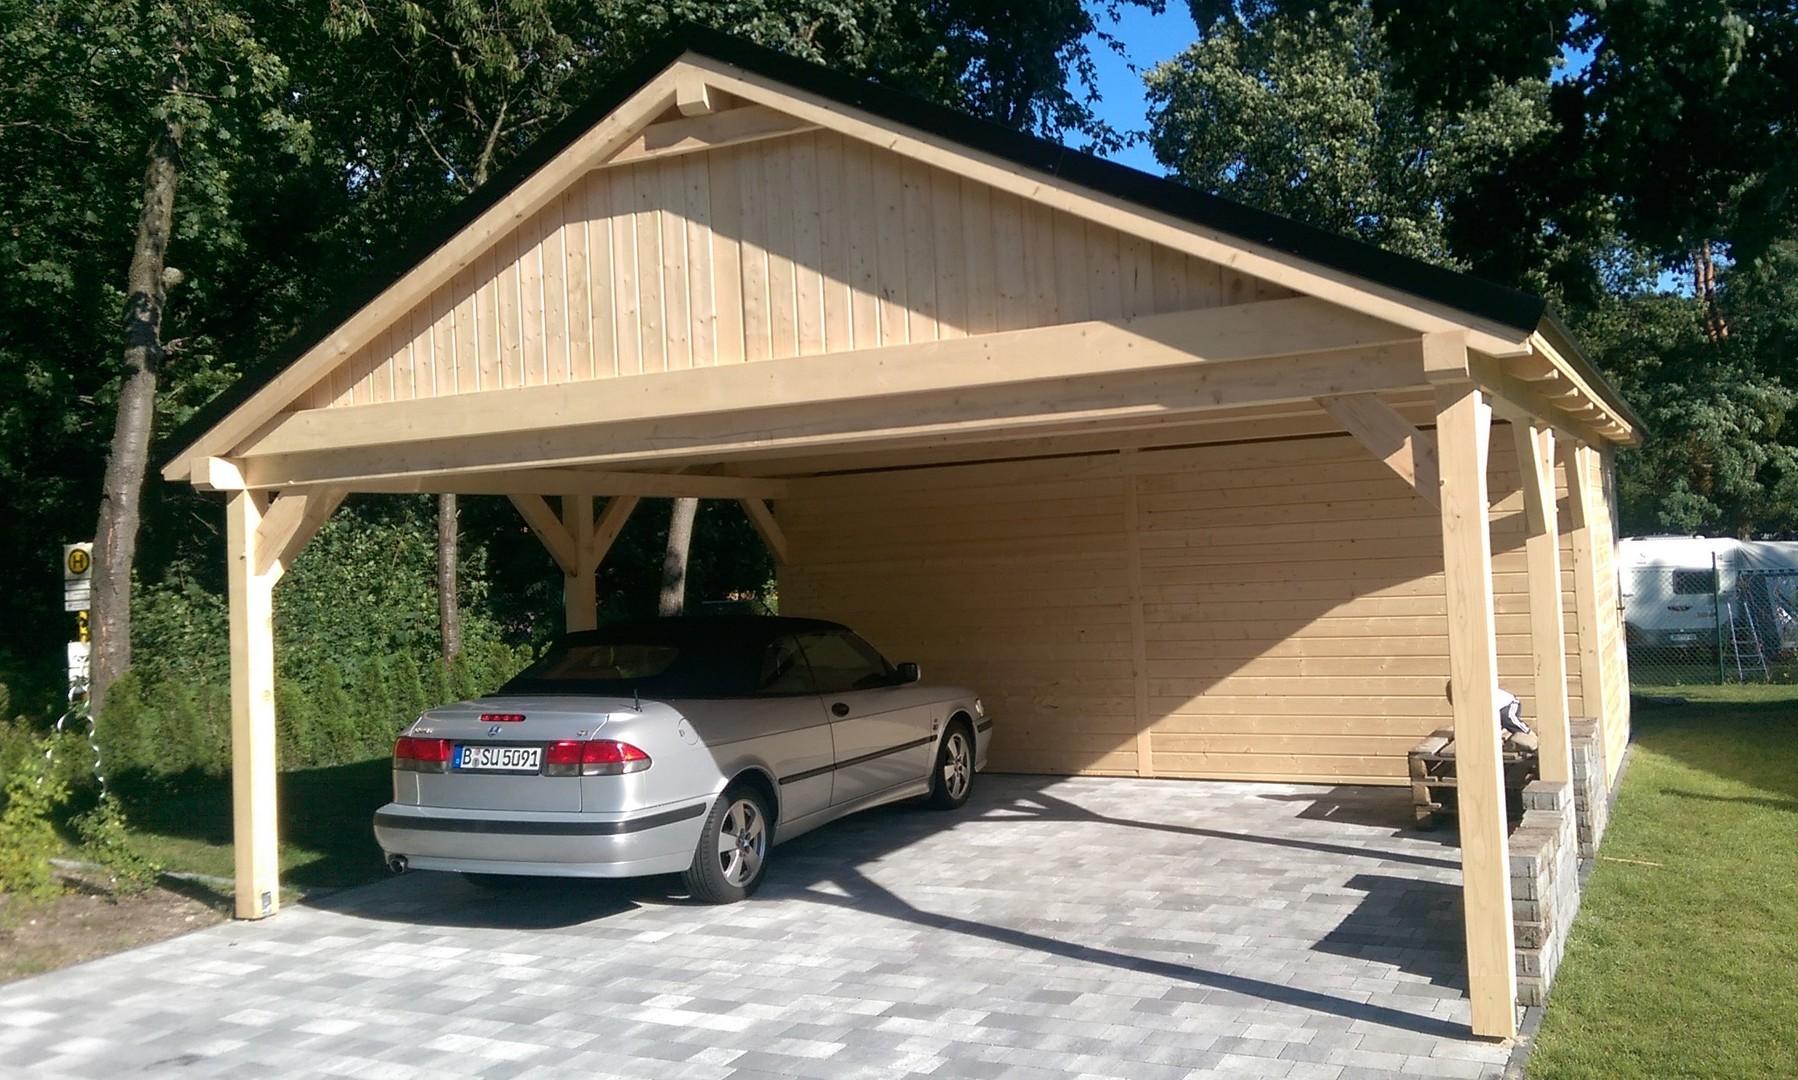 projekte carport aus polen berdachung polnische holzprodukte carport holz. Black Bedroom Furniture Sets. Home Design Ideas